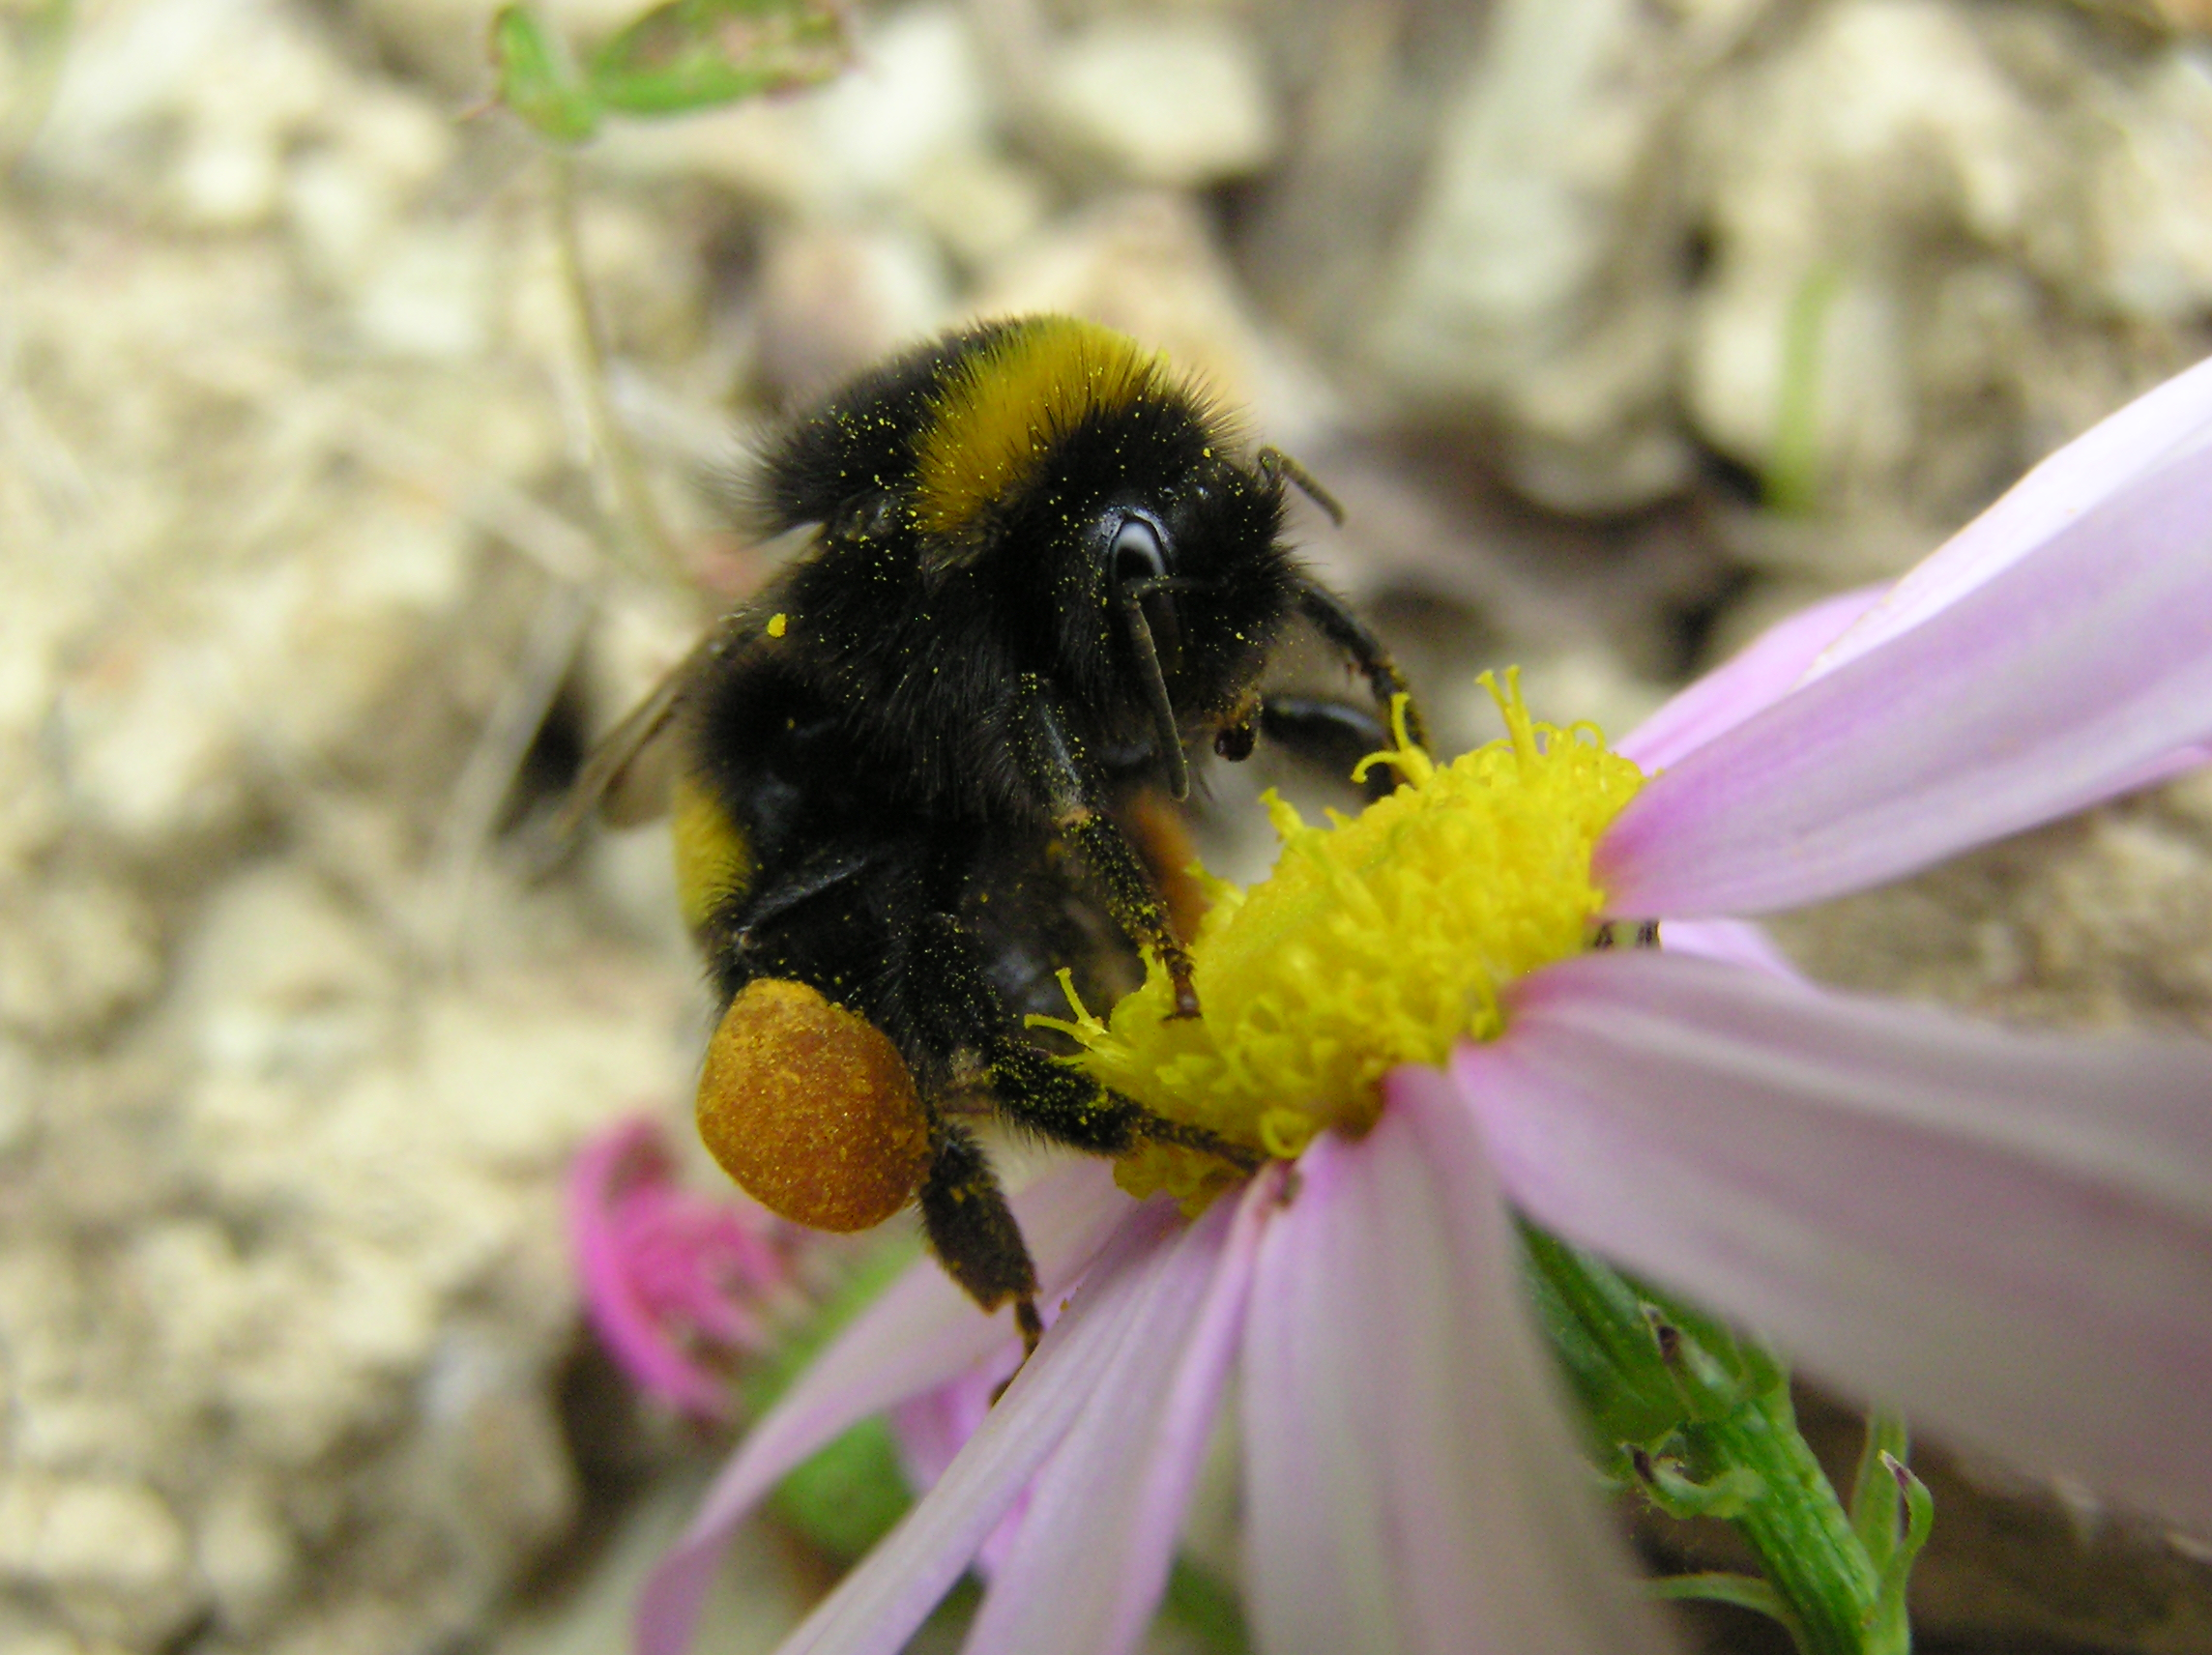 The Bees' Needs: Garden Tips for Creating Habitat - Dyck Arboretum